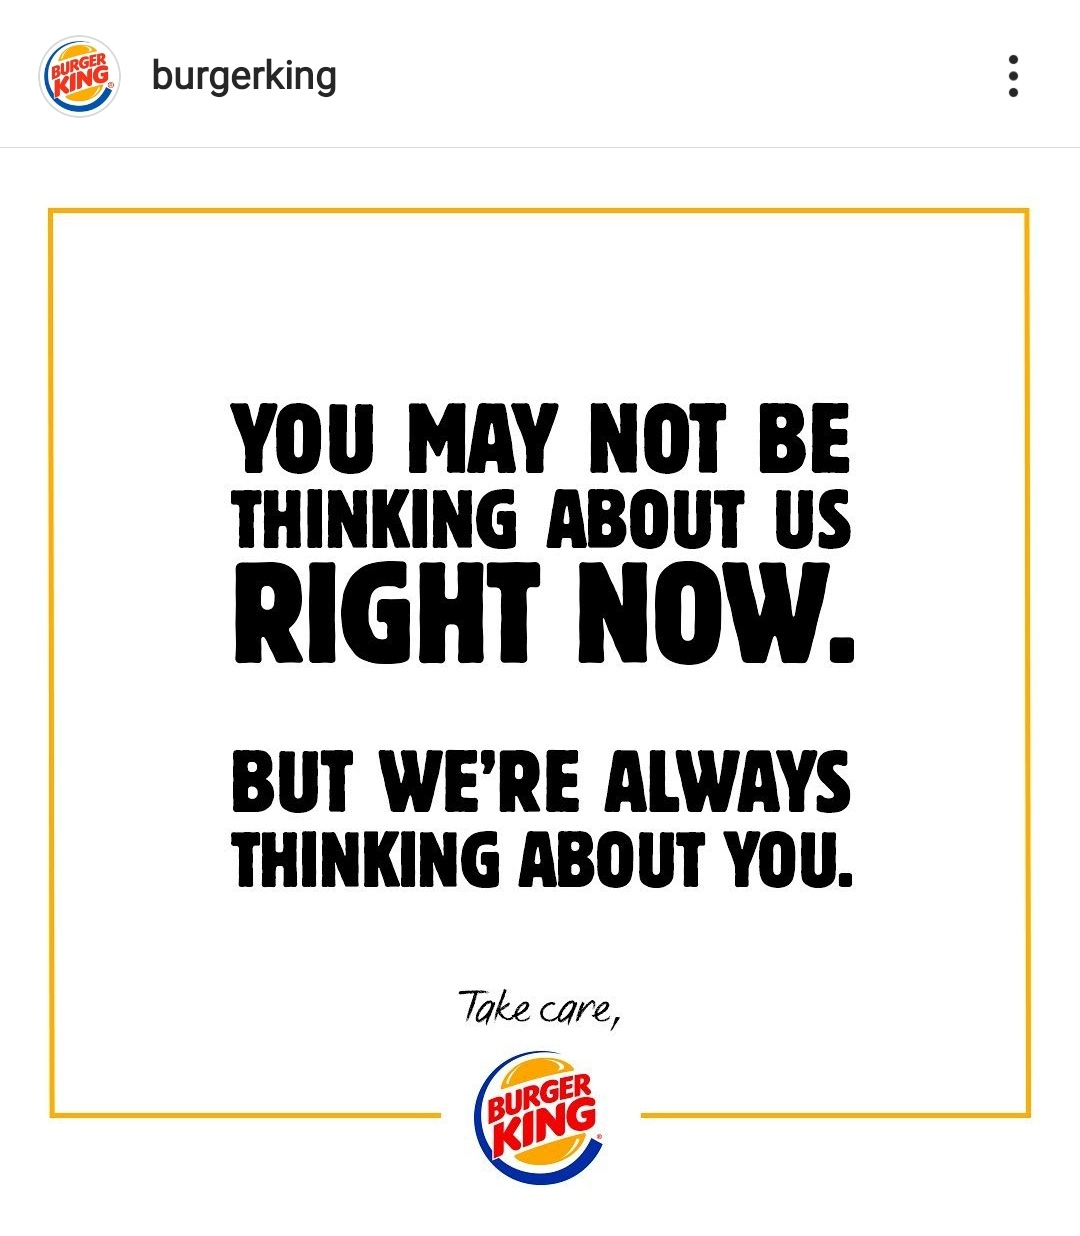 burger king brand awareness covid